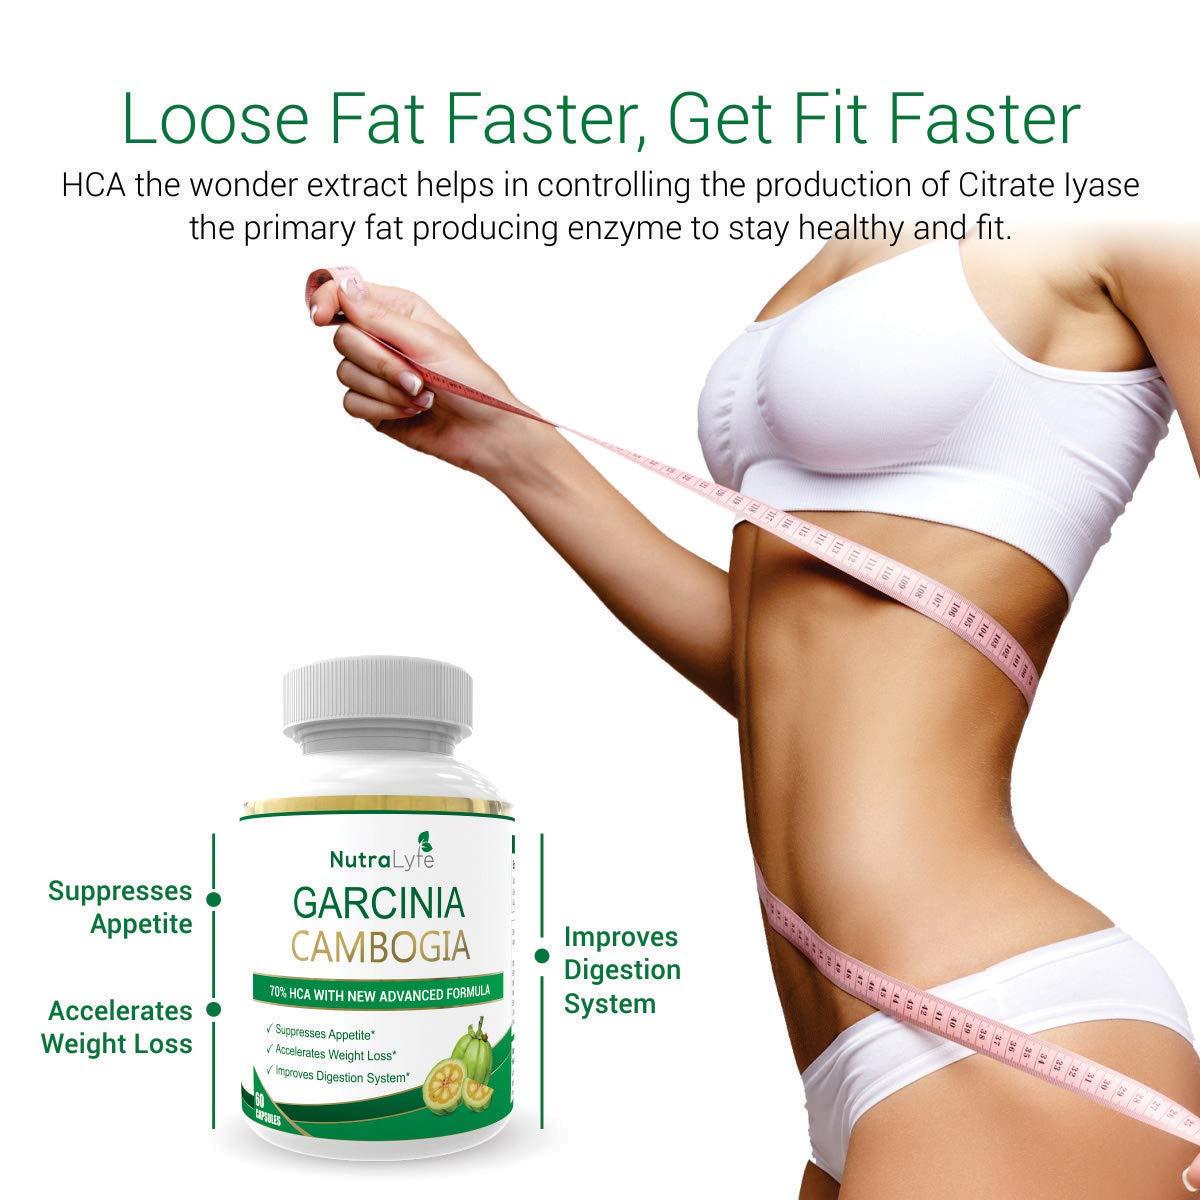 Buy Nutralyfe Garcinia Cambogia Extract 70 Hca For Quick Weight